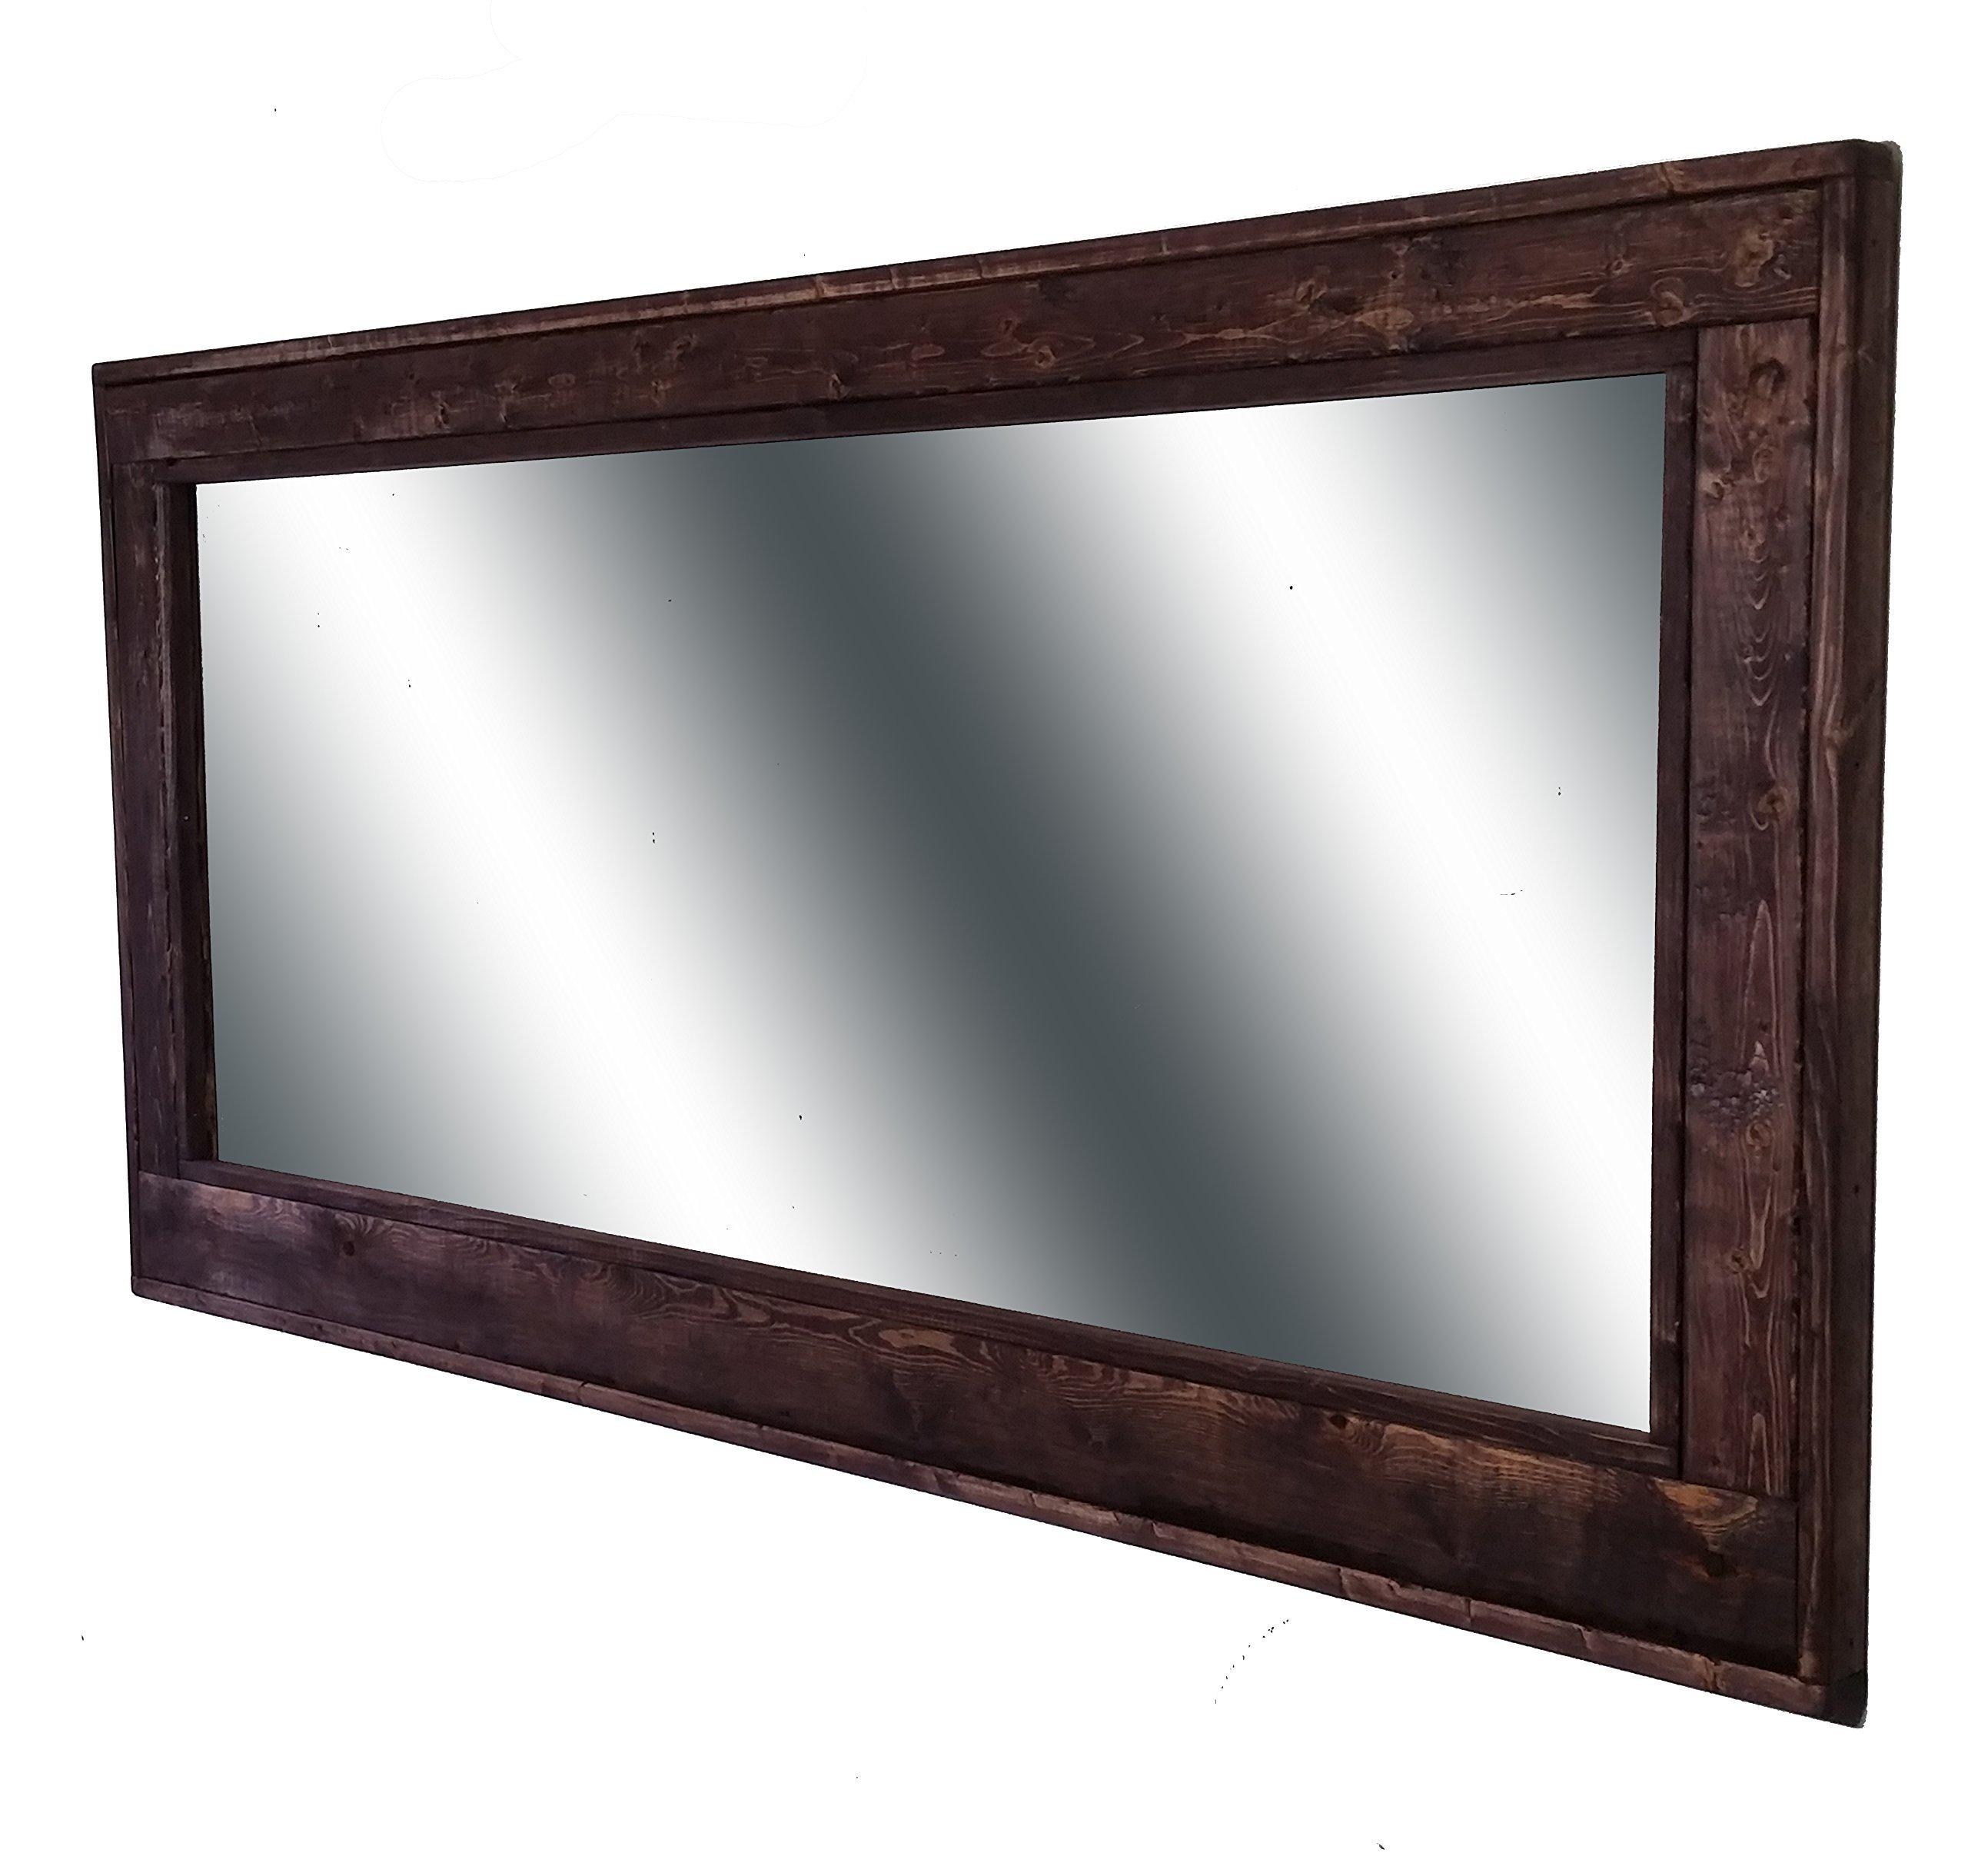 60 x 30 Herringbone Double Vanity Mirror Red Mahogany Stain Reclaimed Wood Framed Mirror - Large Wall Mirror - Rustic Modern Home - Home Decor - Mirror - Wood work by Renewed Decor